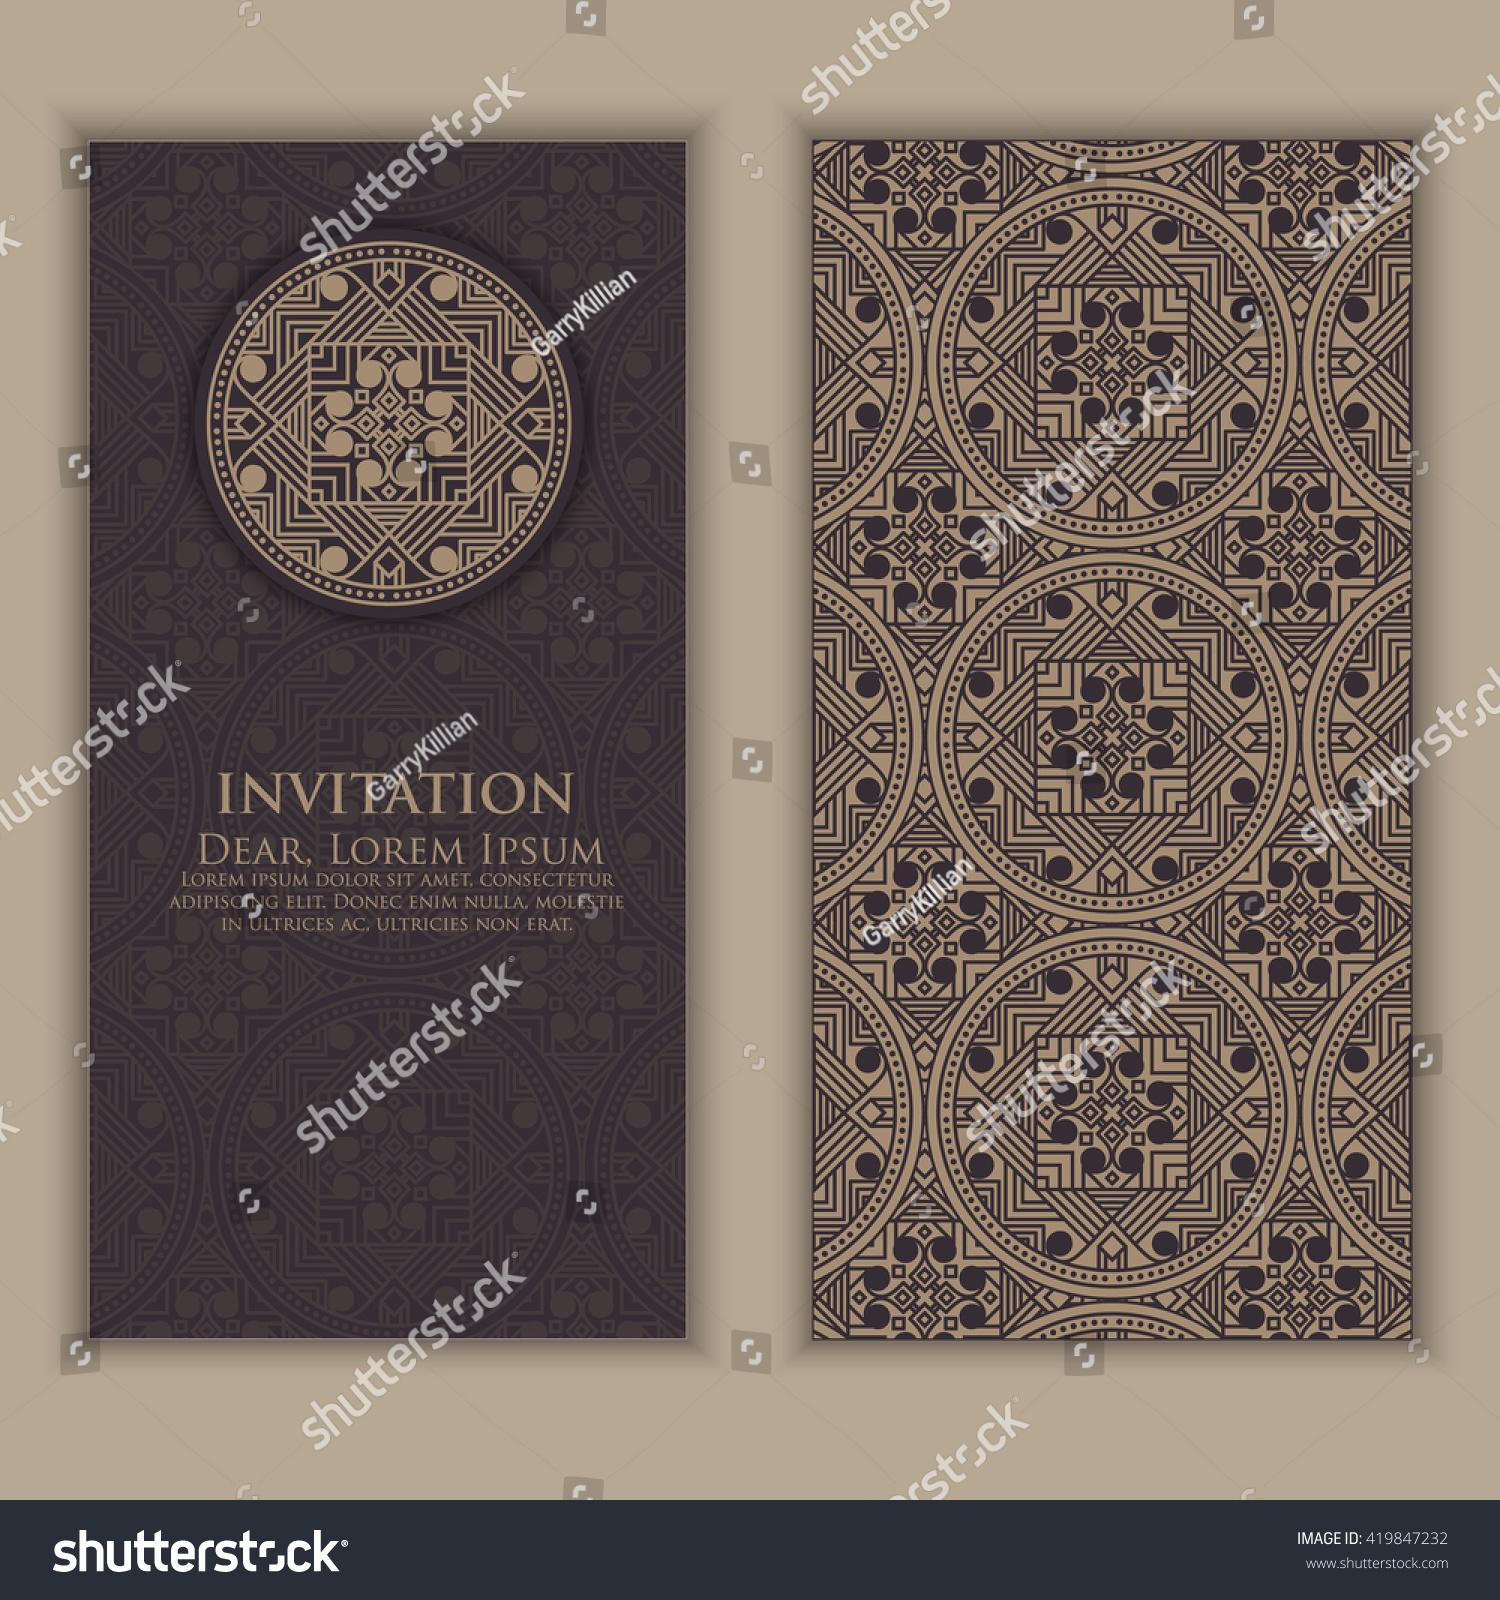 Invitation cards ethnic arabesque elements arabesque stock for Arabesque style decoration